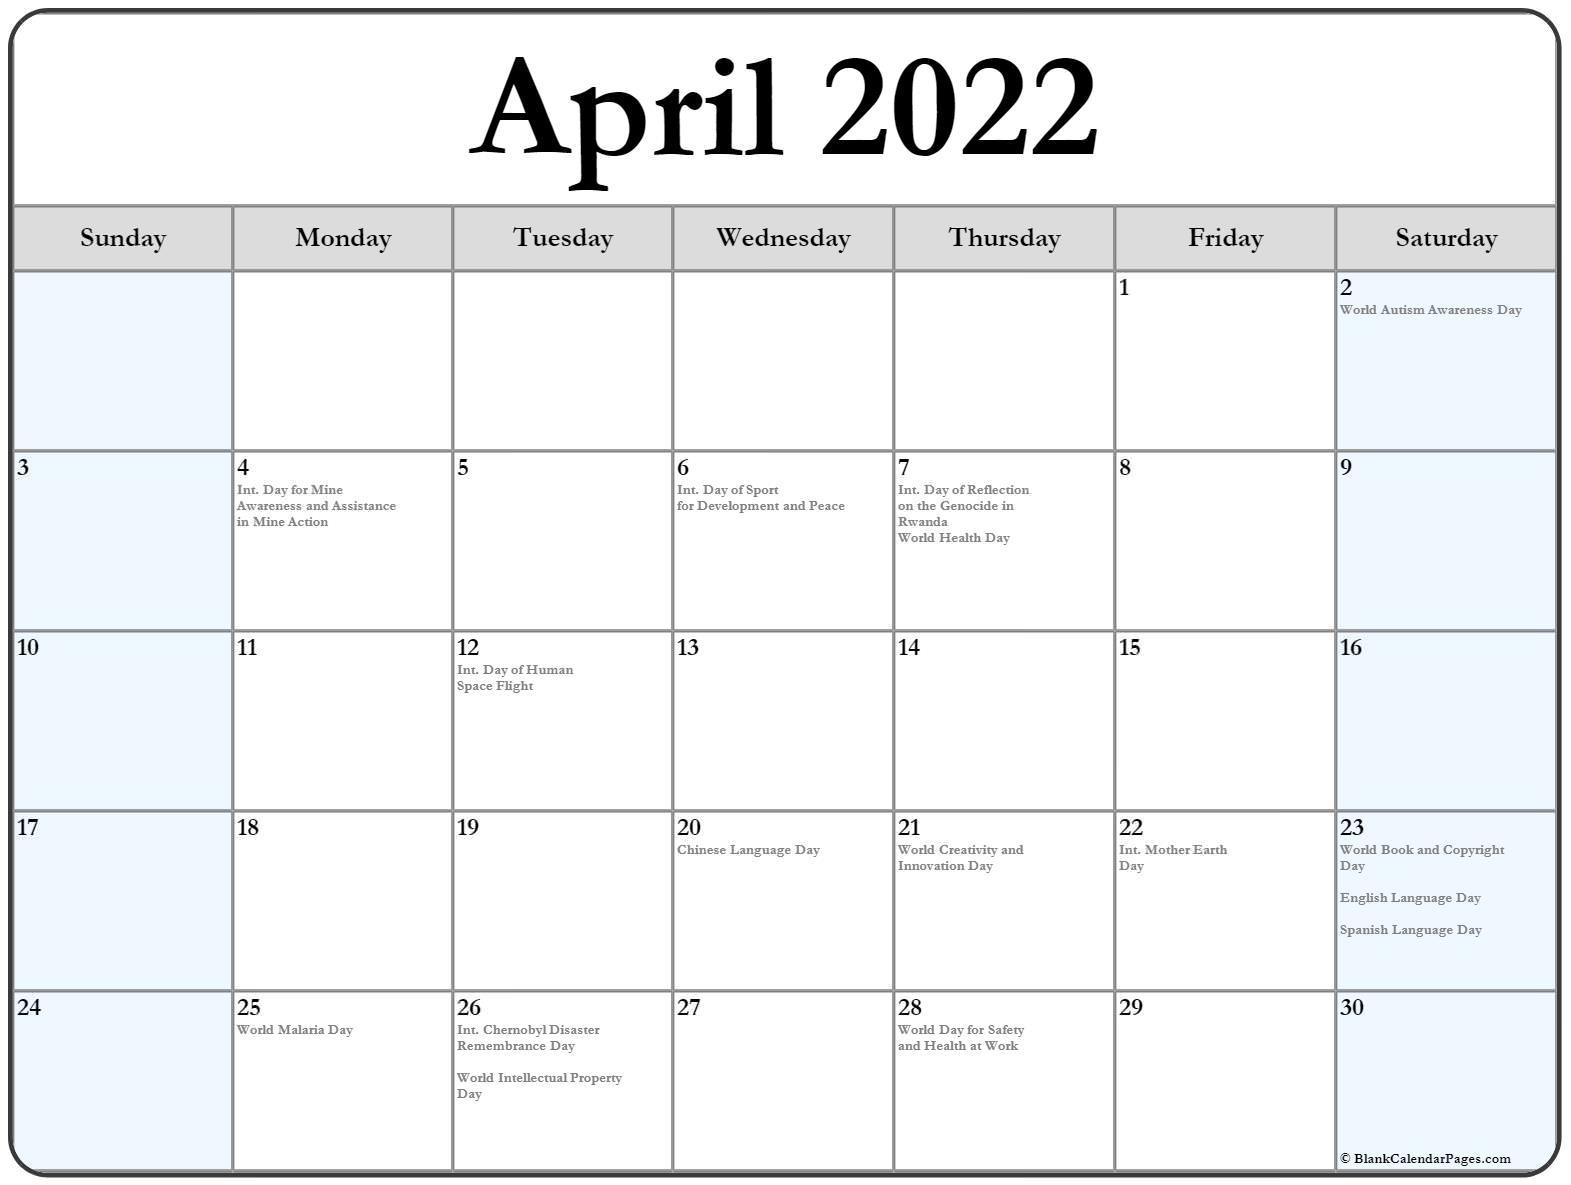 April 2022 Calendar With Holidays Inside Calendars March April And May 2022 Calendar